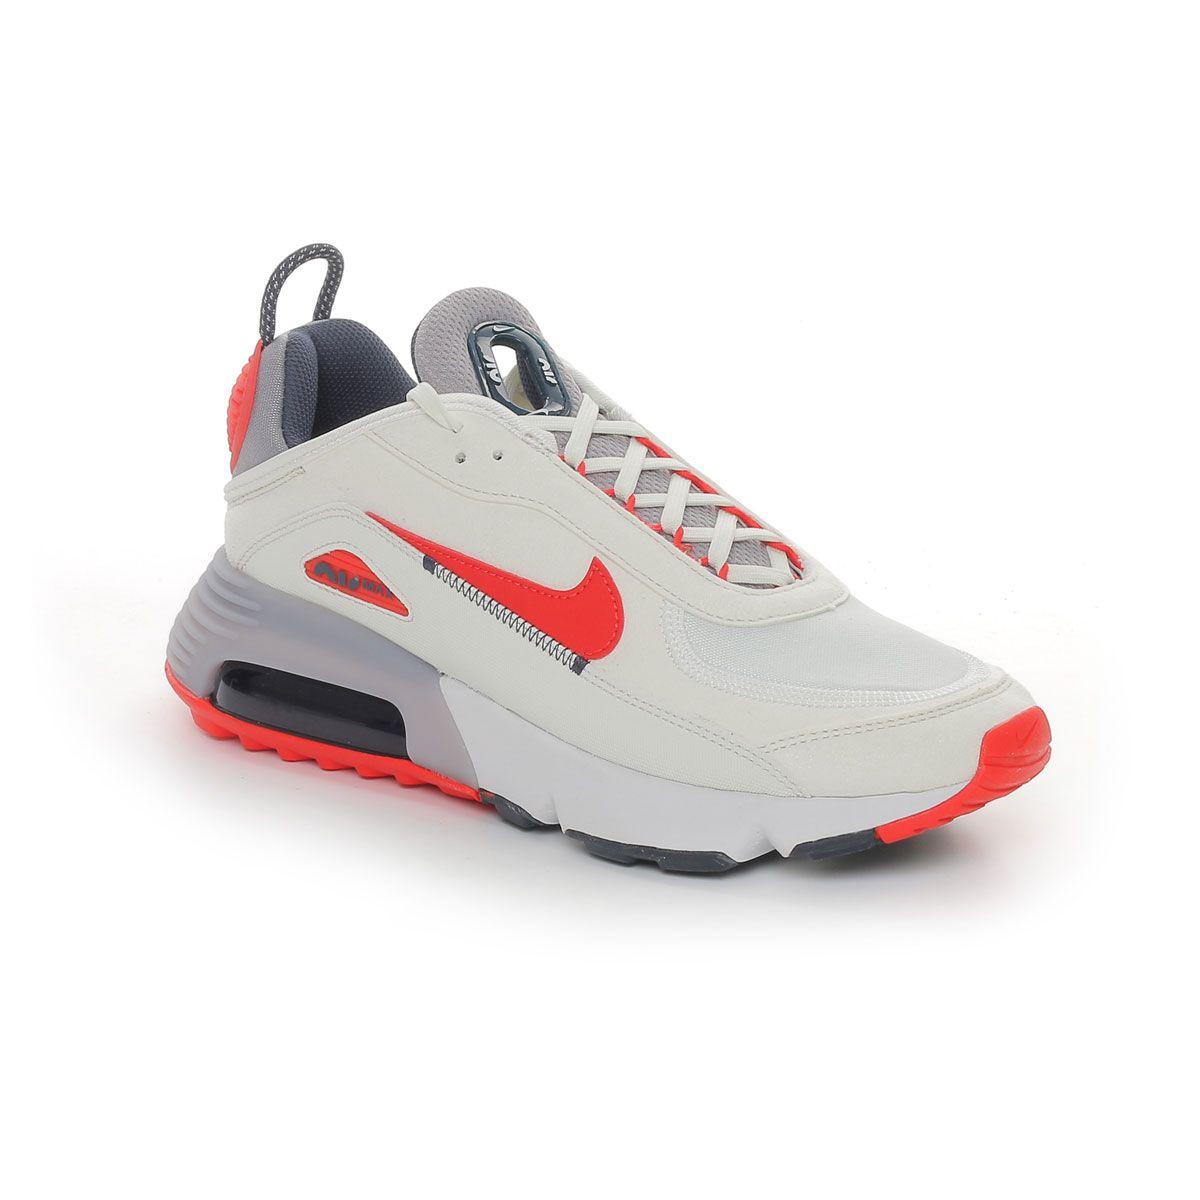 Nike Air Max 2090 Uomo Bianco Rosso